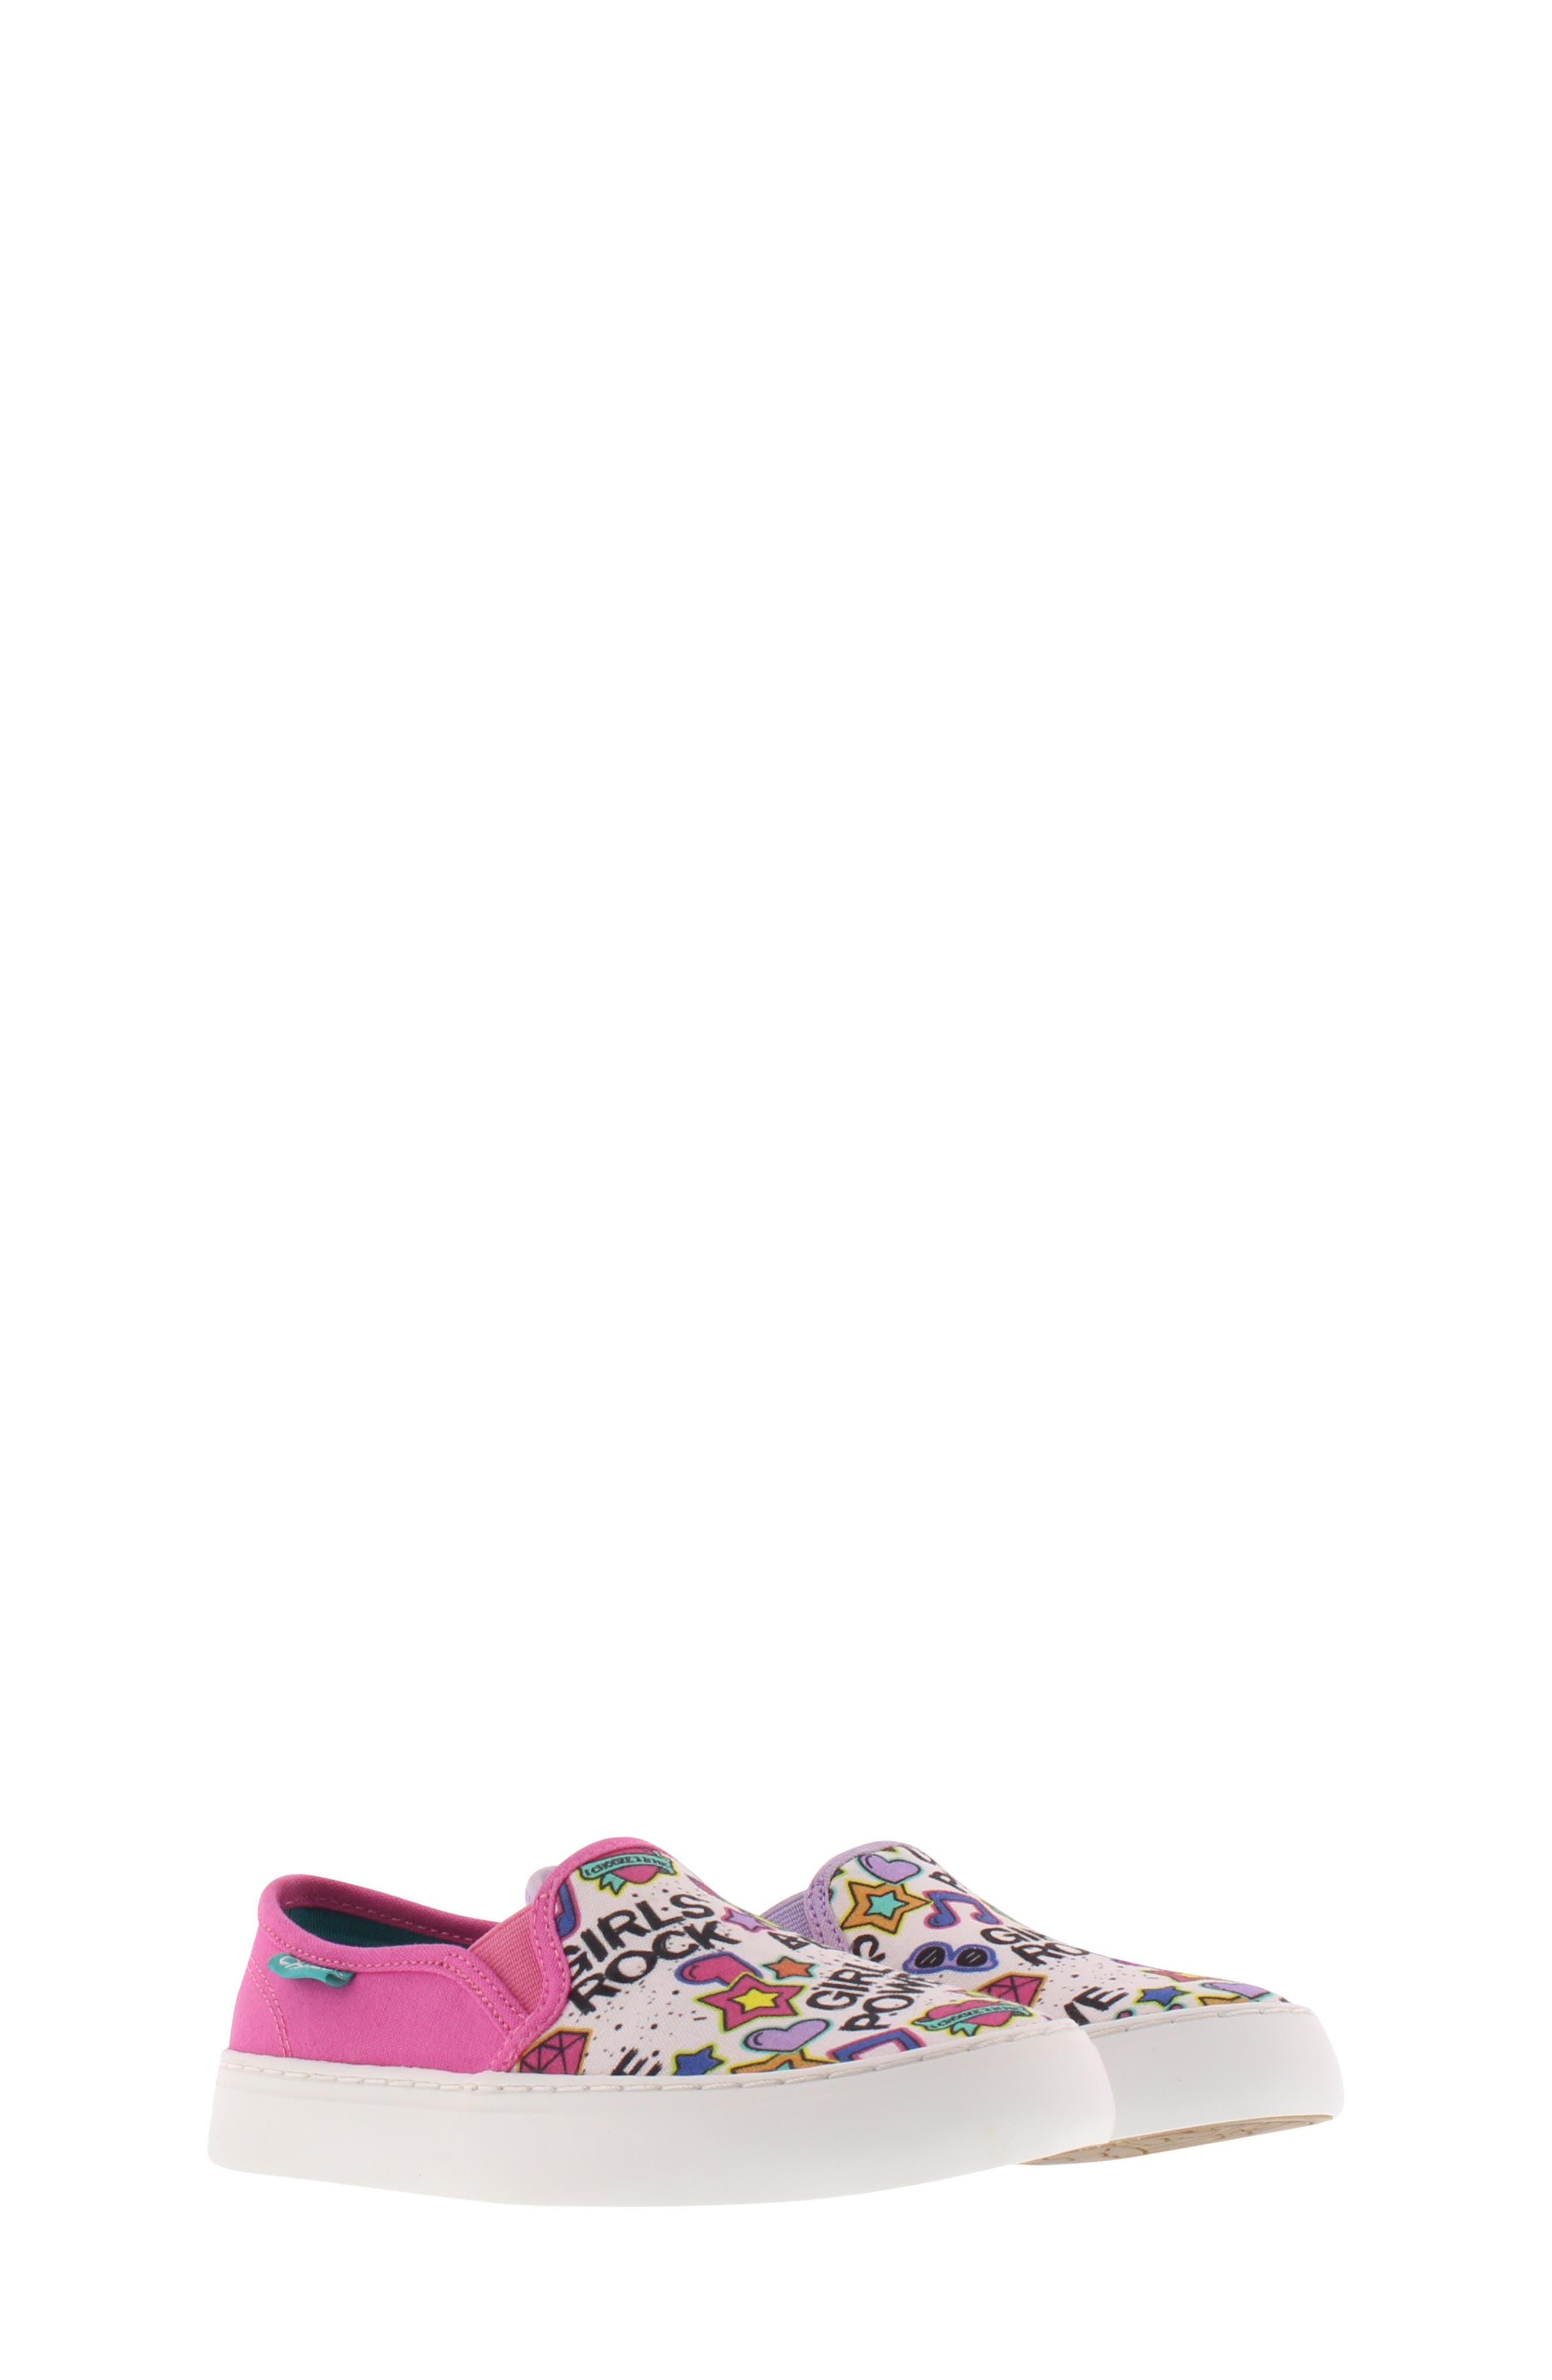 Move Motion Slip-On Sneaker, Main, color, PINK LAVENDER